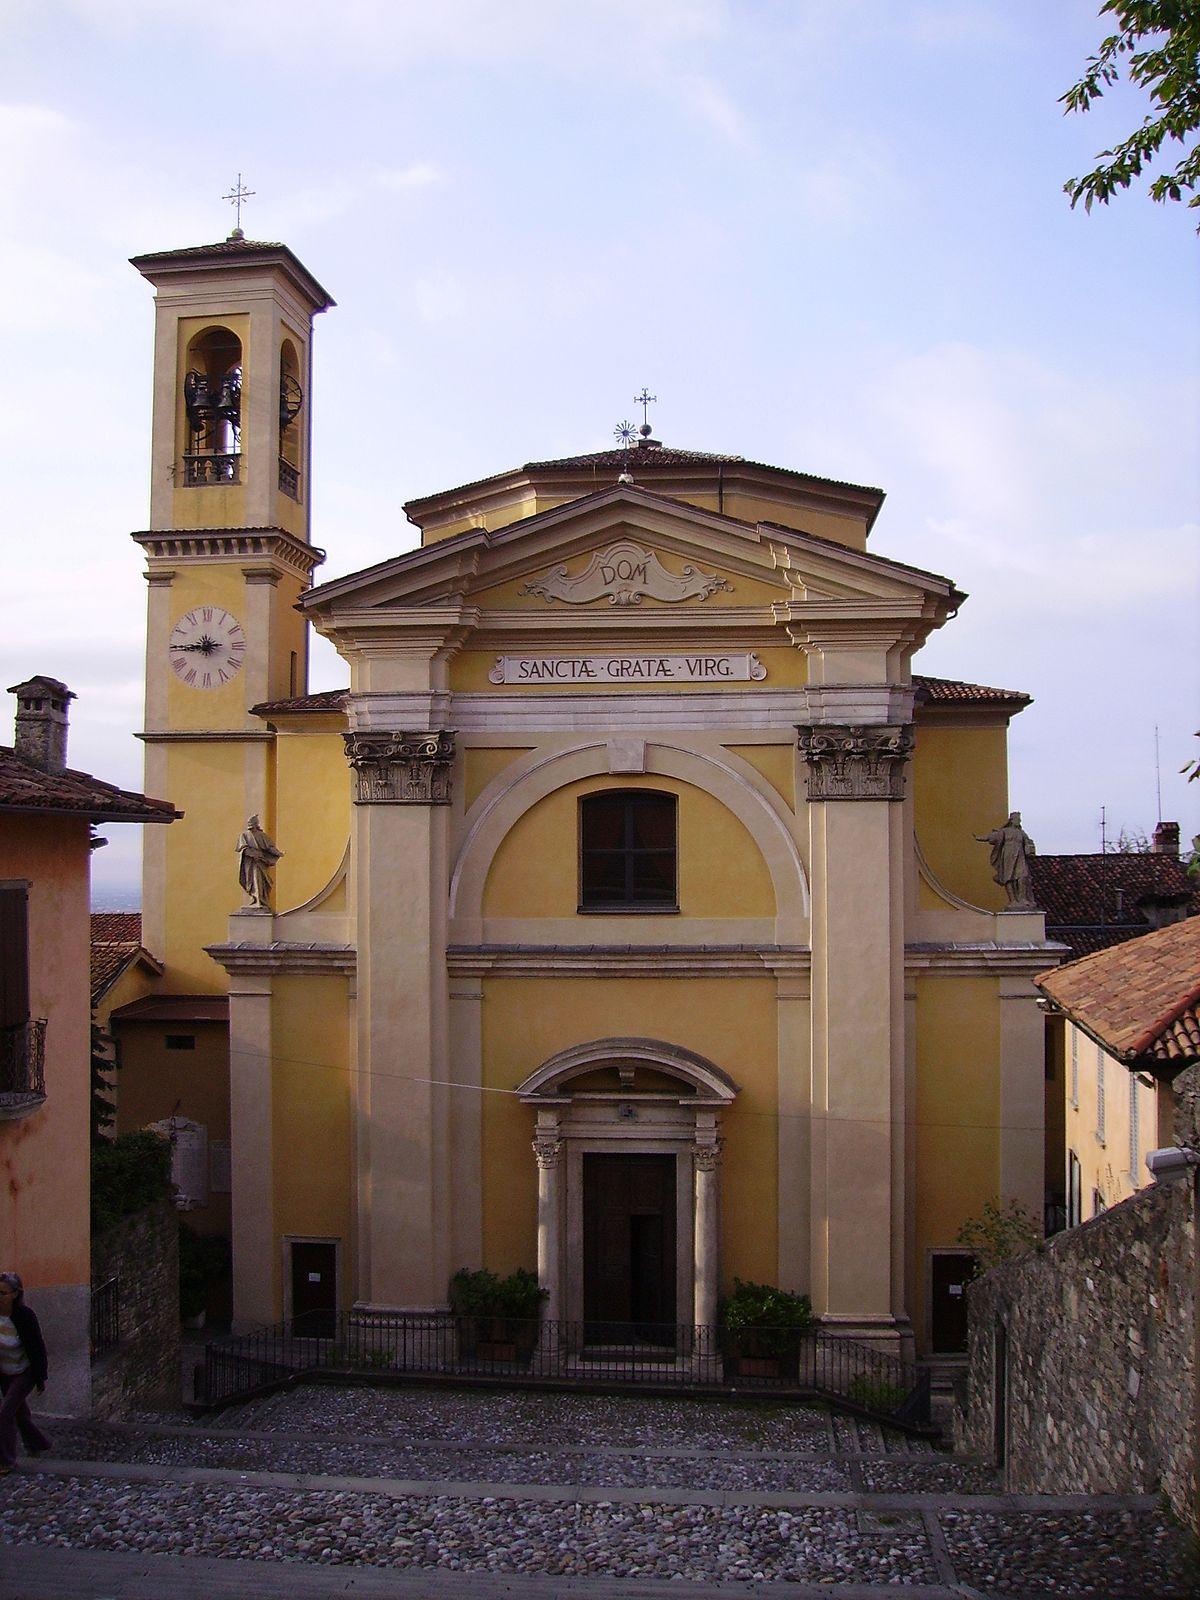 Viva italia 4 - 1 part 2